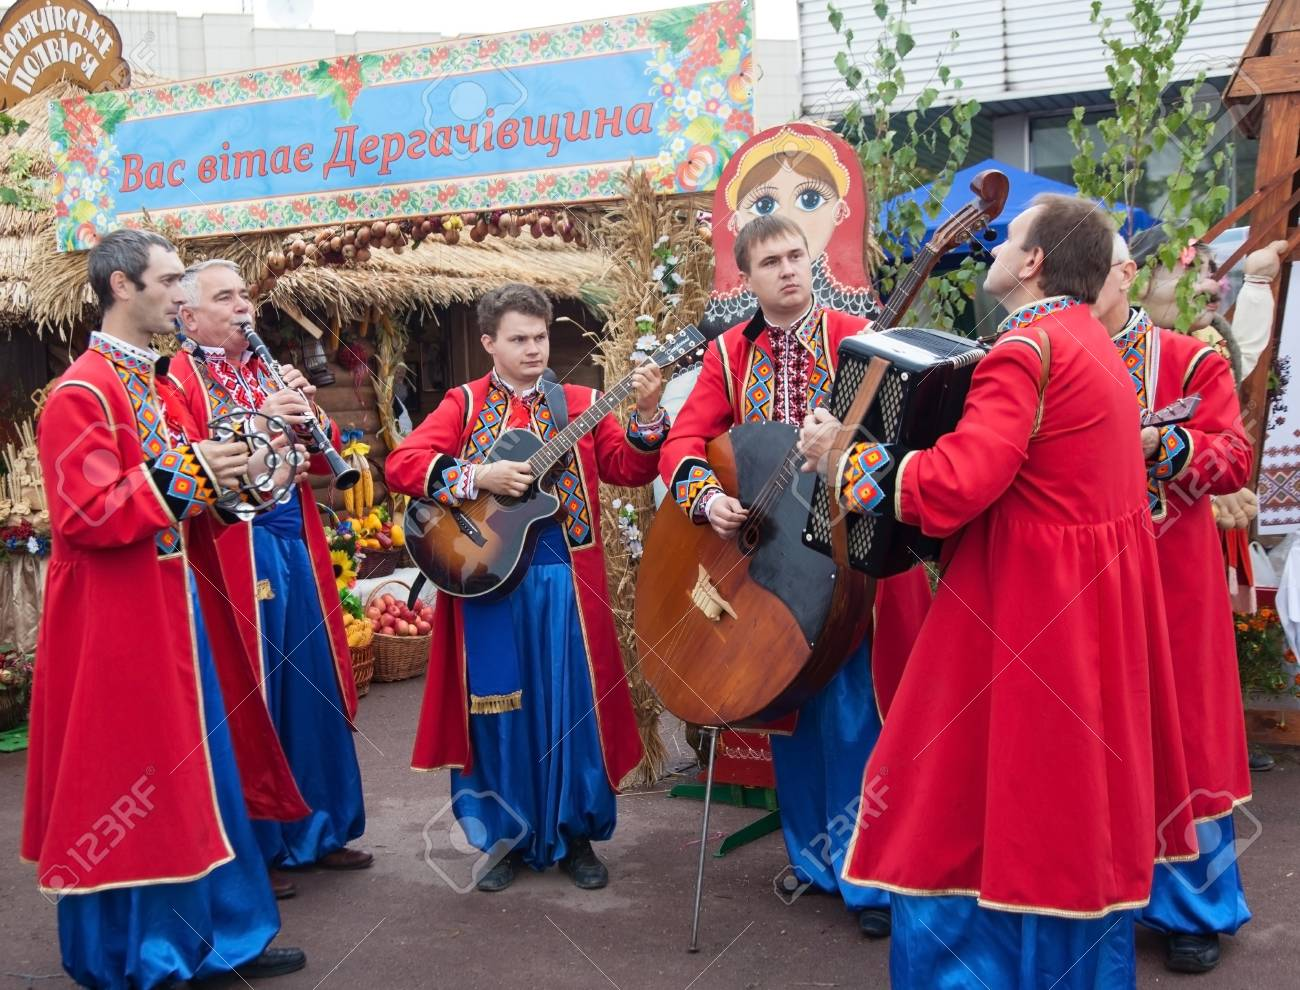 people having fun playing music, entertain people at the fair Stock Photo - 22190617